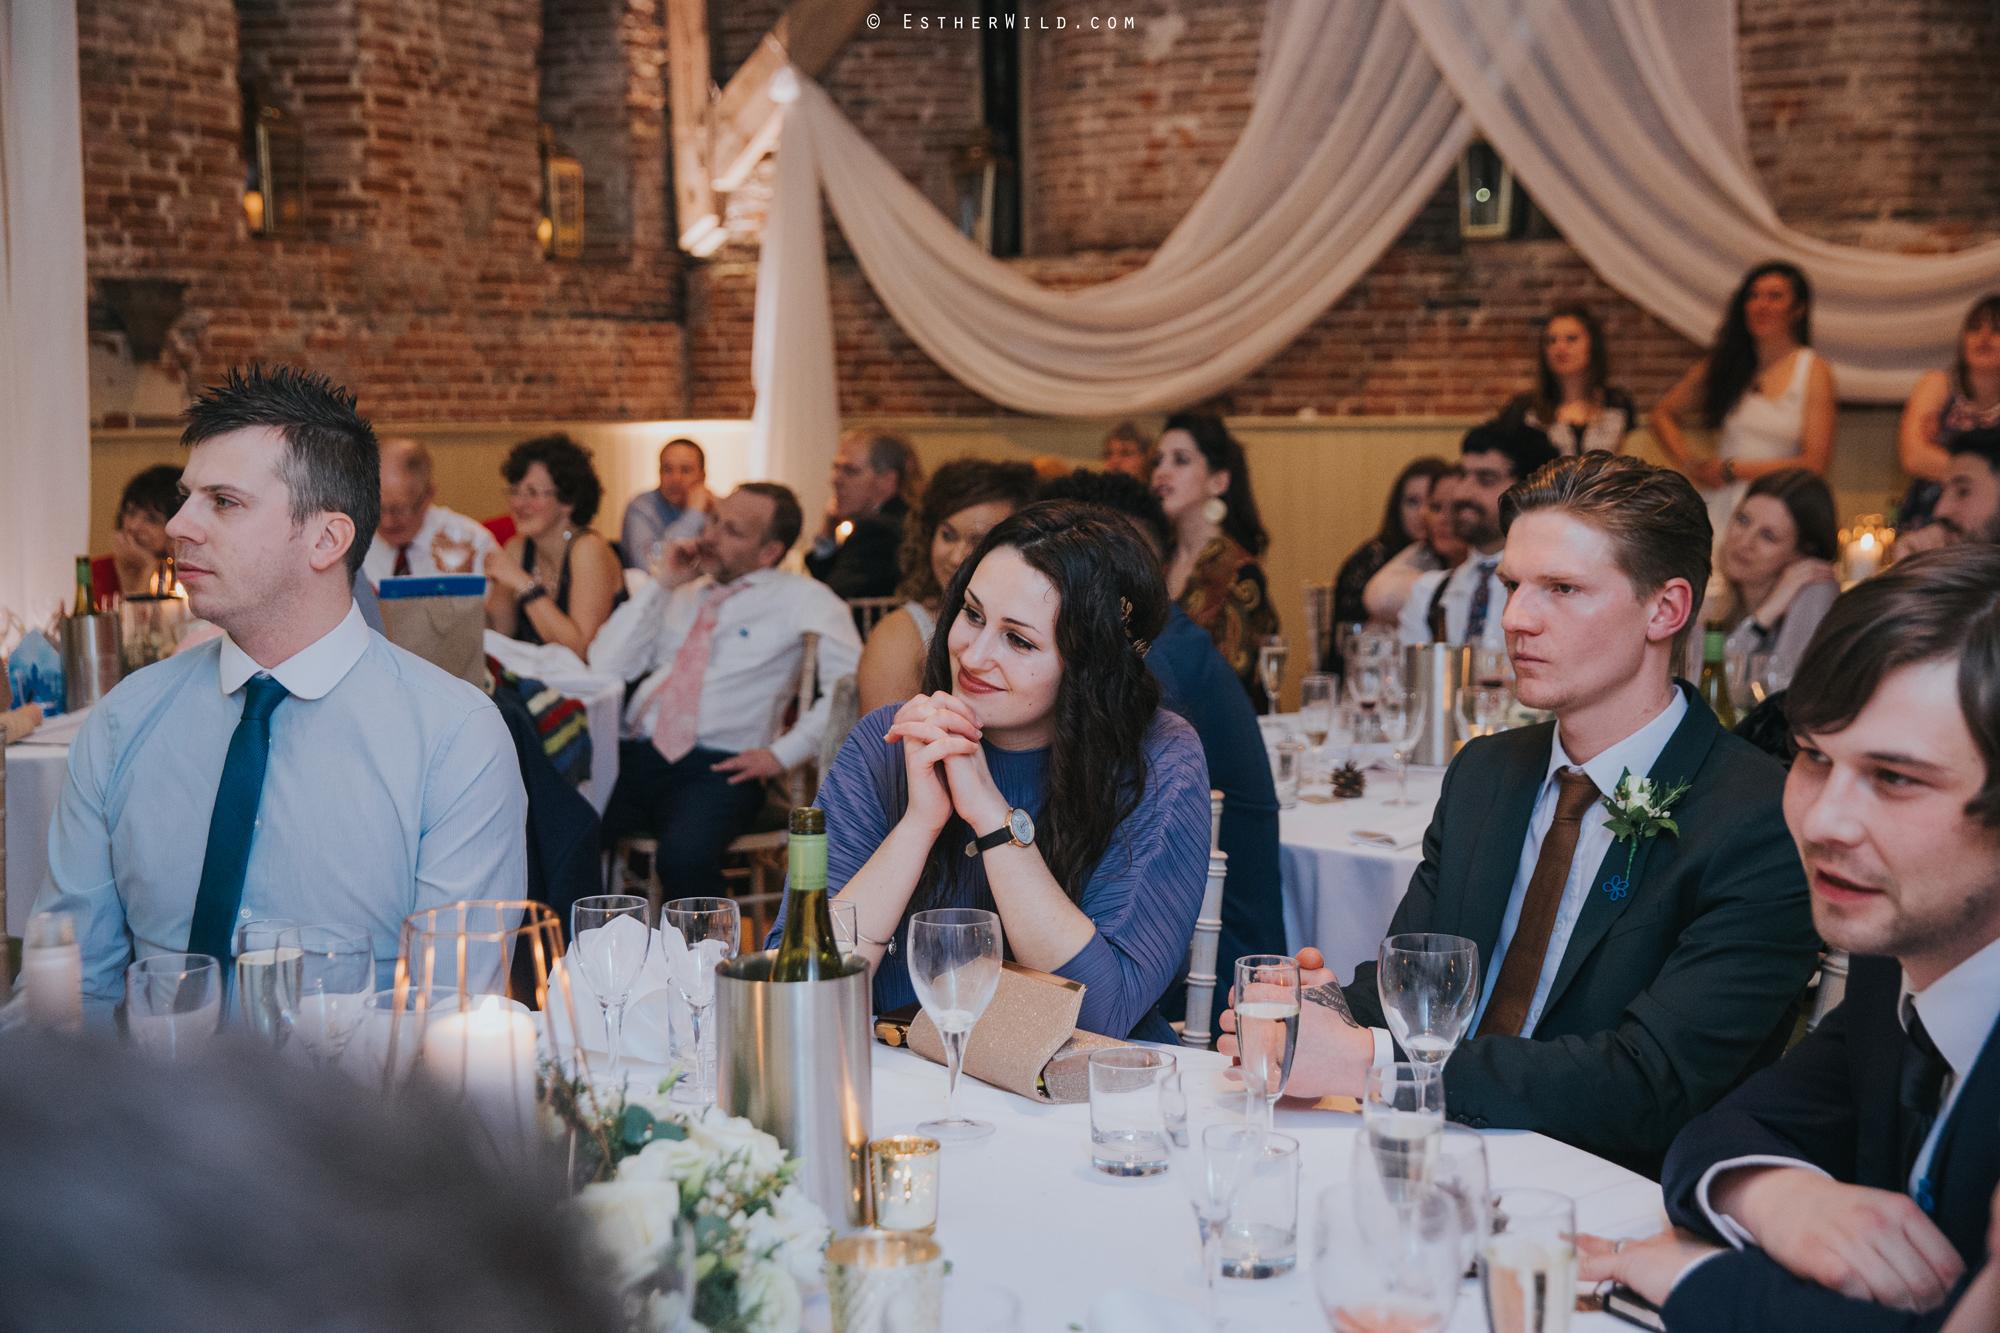 Elms_Barn_Weddings_Suffolk_Photographer_Copyright_Esther_Wild_IMG_2597.jpg